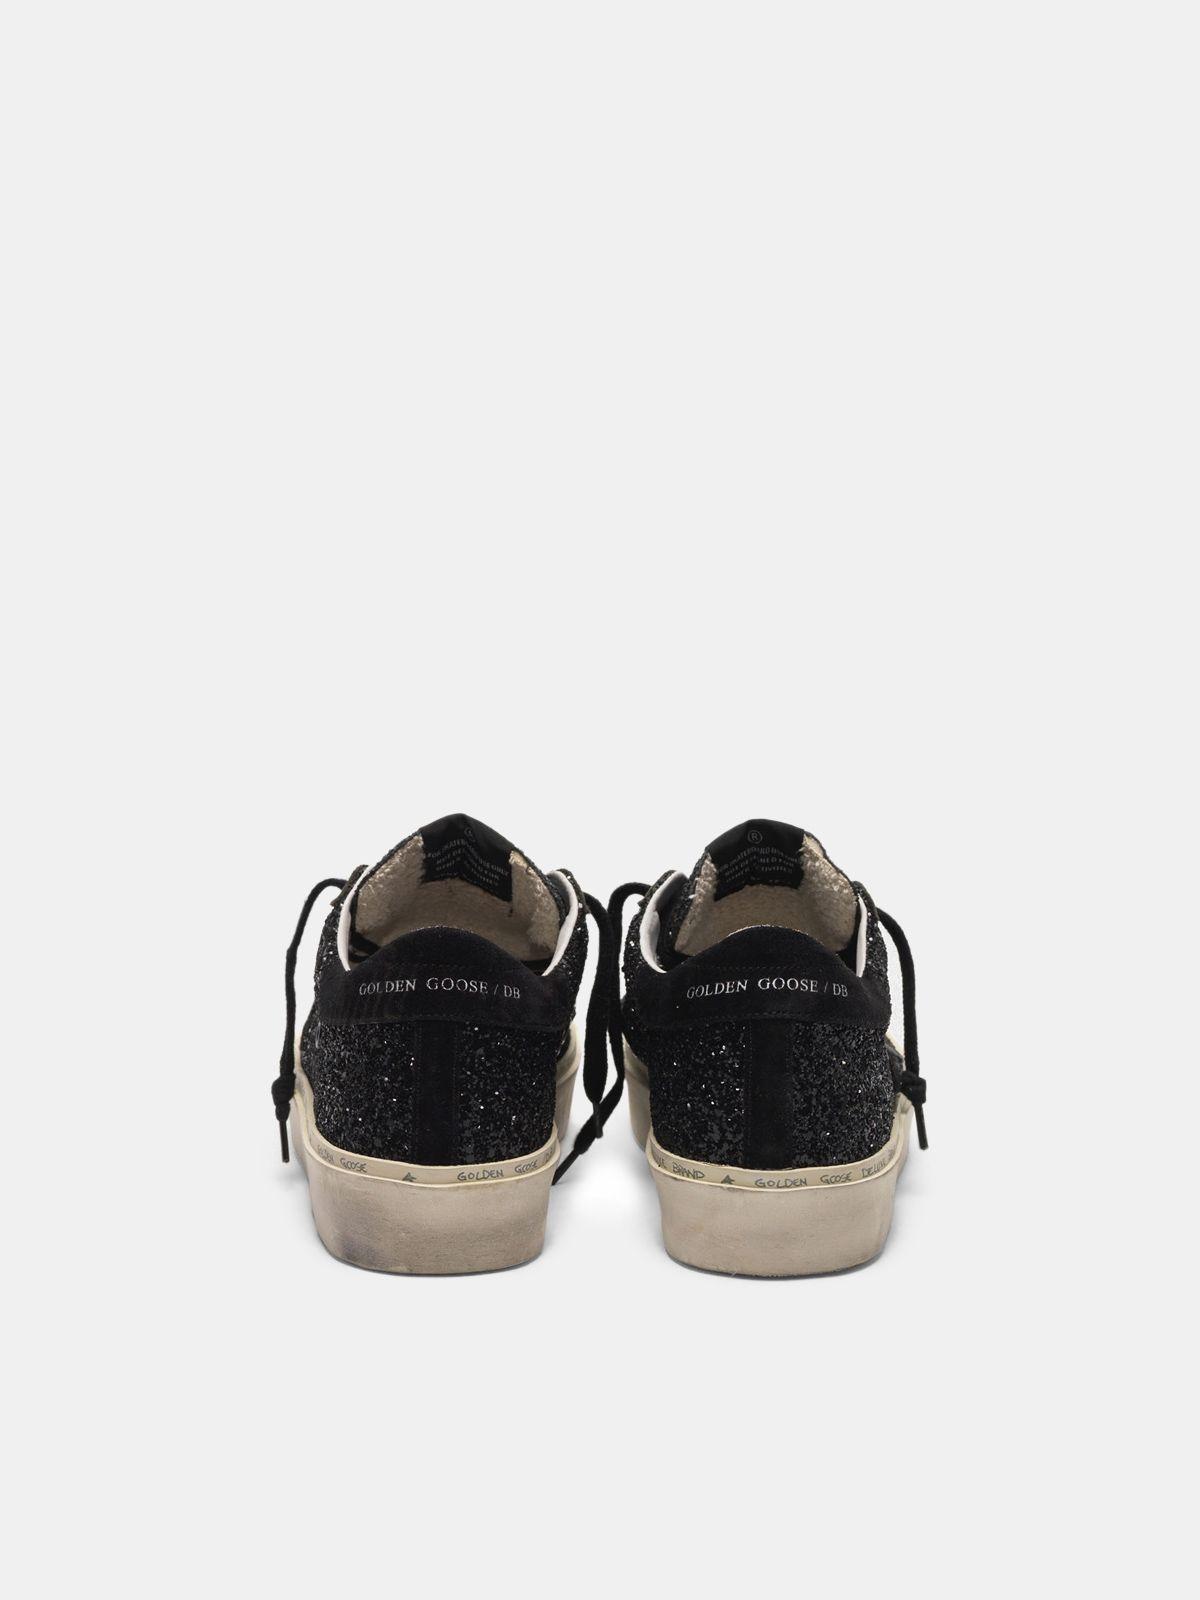 Golden Goose - Hi Star sneakers black glitter upper in